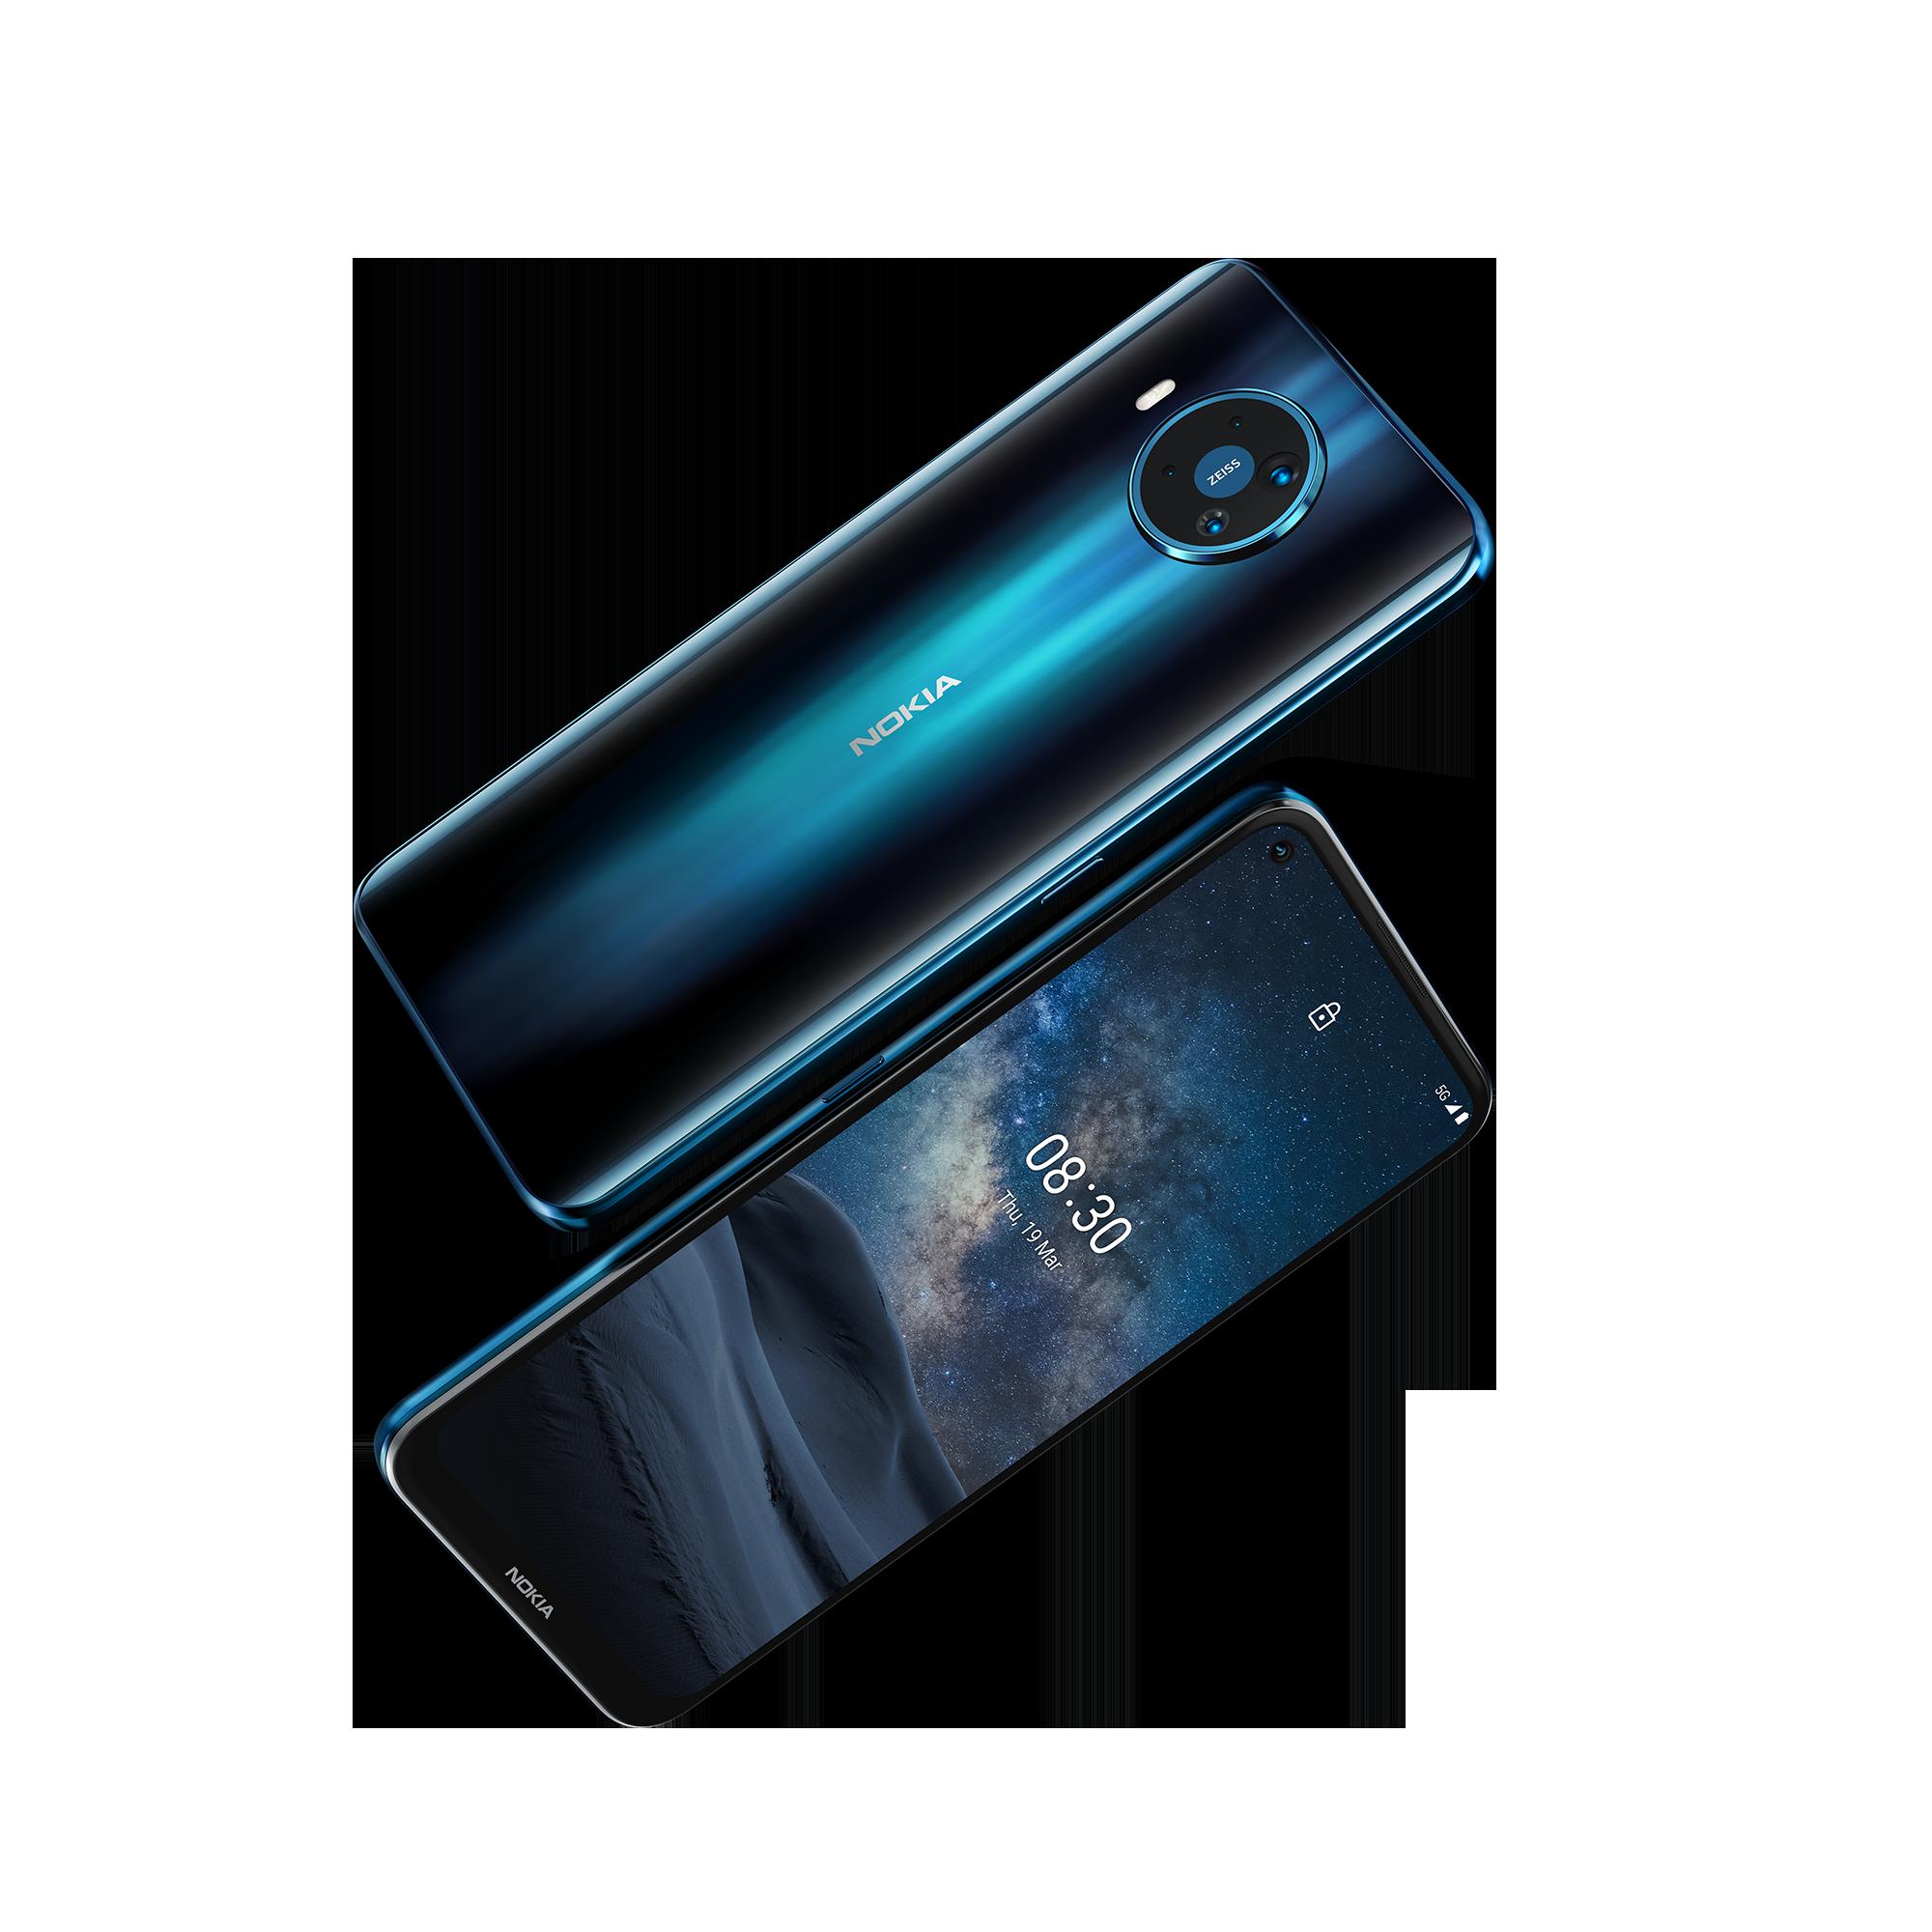 HMD Global introduceert wereldwijde IoT- en enterprise device roaming-oplossing met centraal SIM-beheer 'HMD Connect Pro'